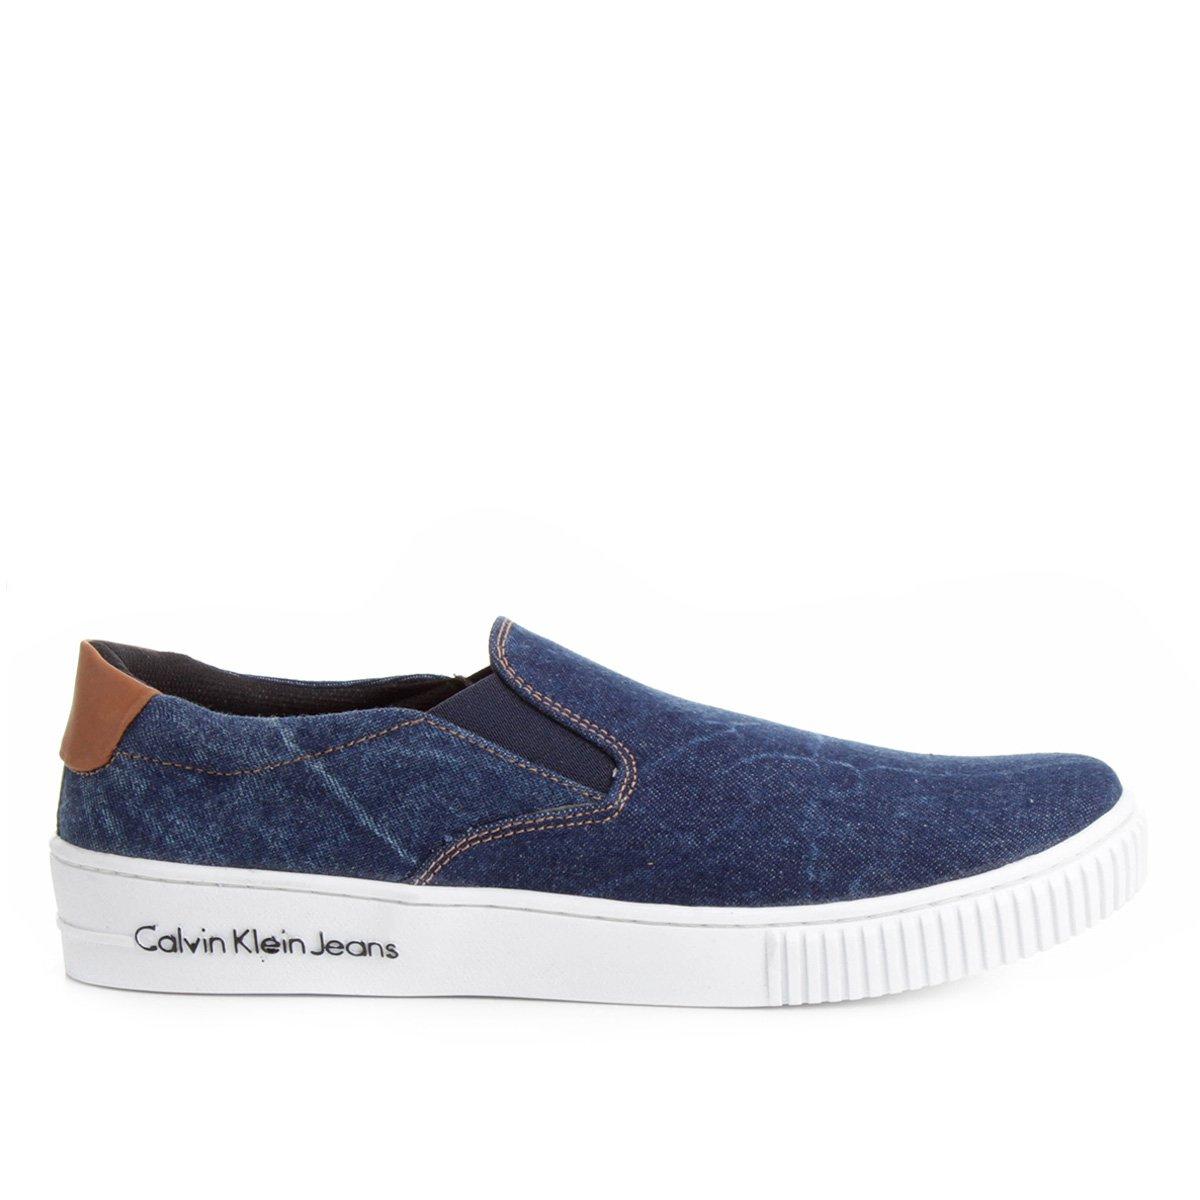 2cab48c3a348c Sapatênis Calvin Klein Iate Jeans Masculino - Compre Agora   Netshoes